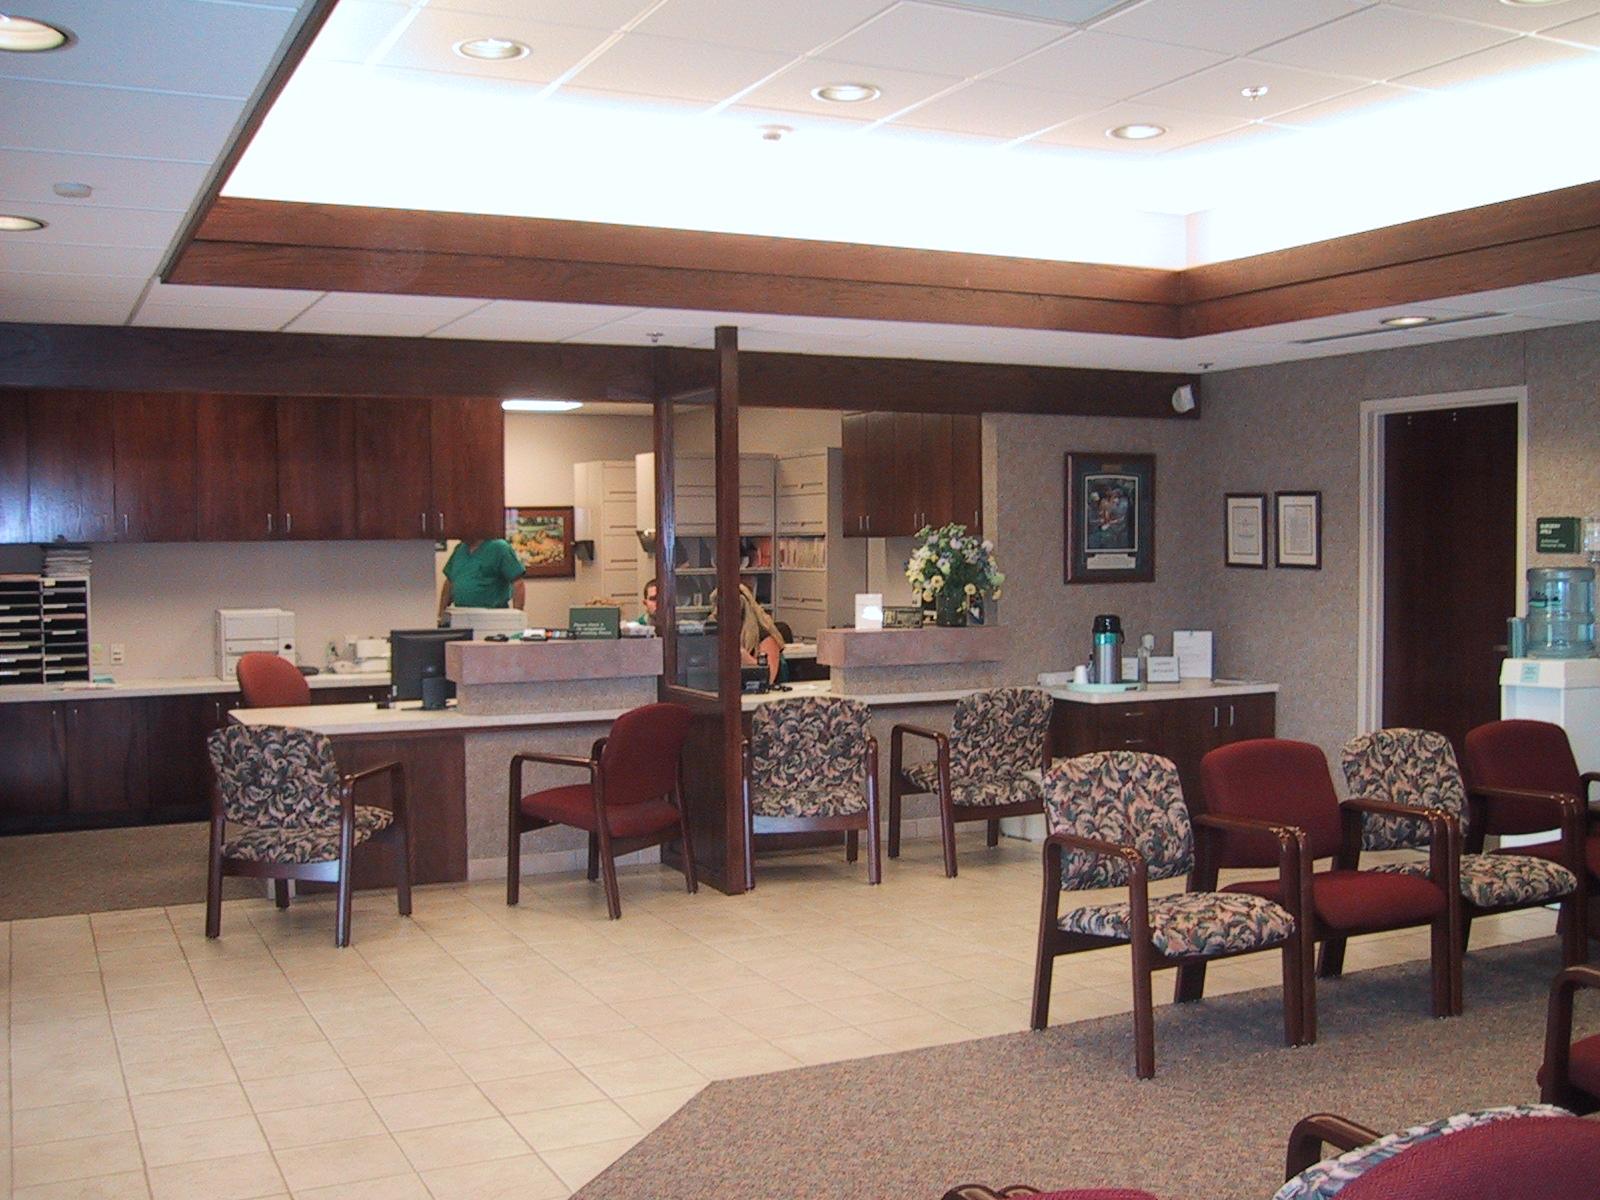 Surgery Center Interior 3.JPG